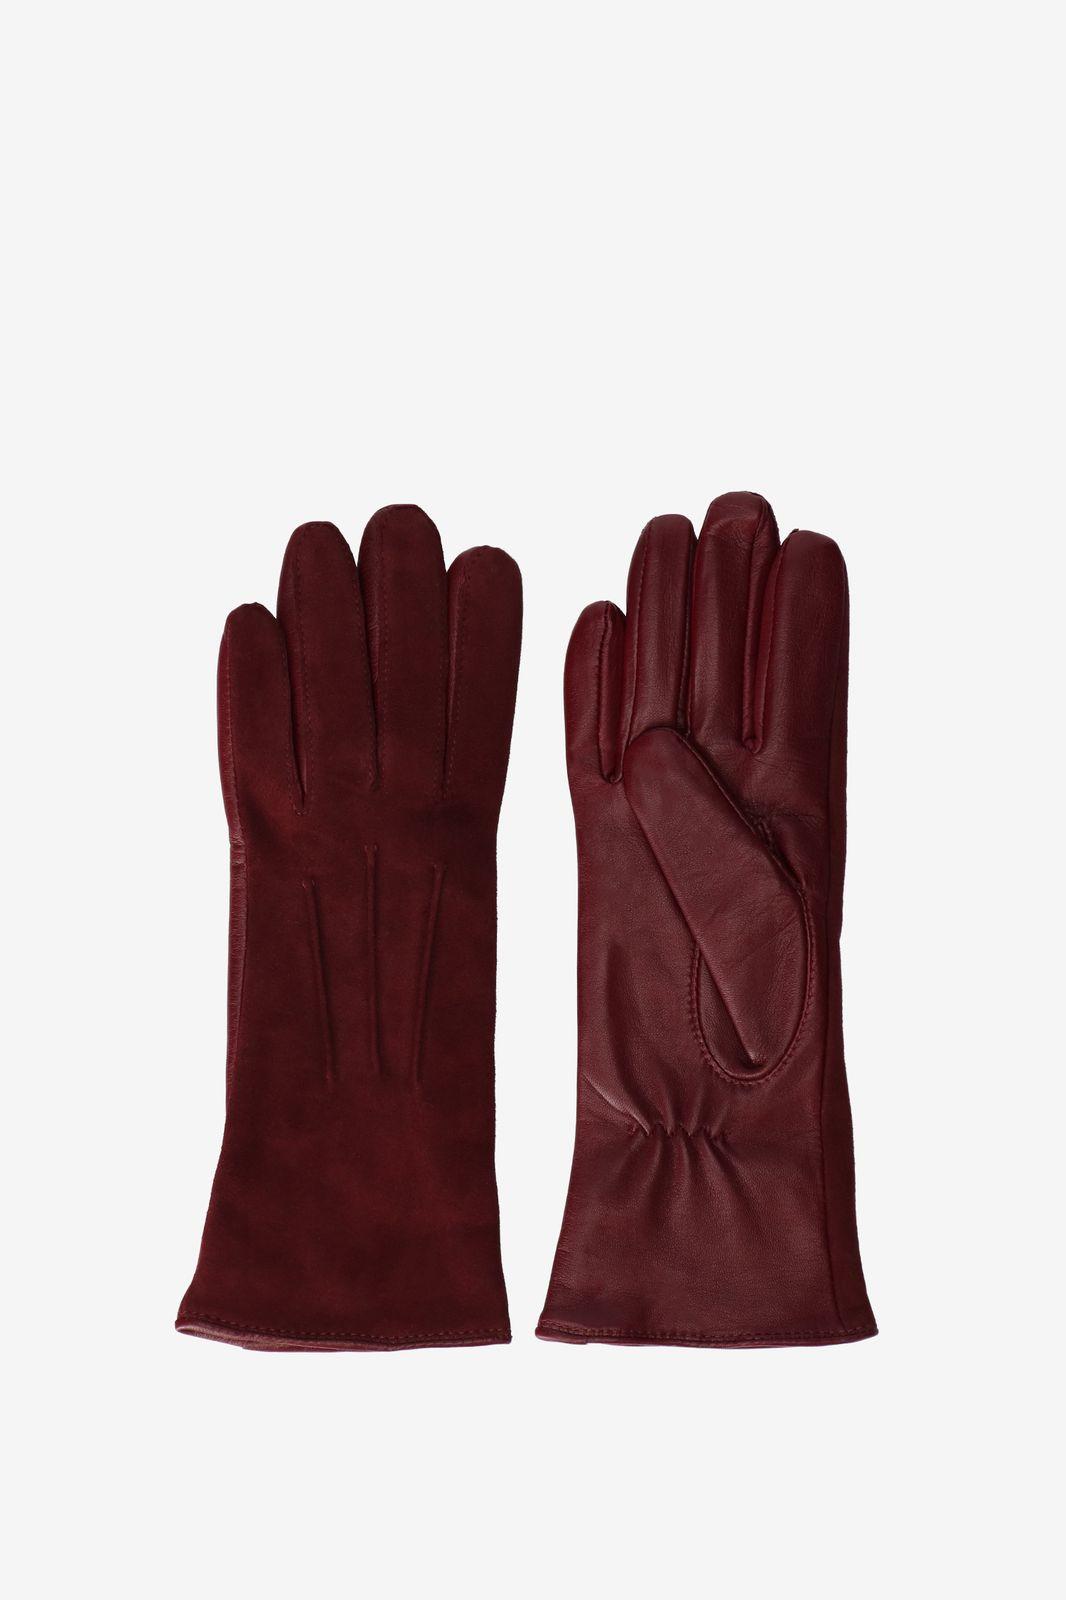 Donkerrode handschoenen leer/suède - Dames | Sissy-Boy